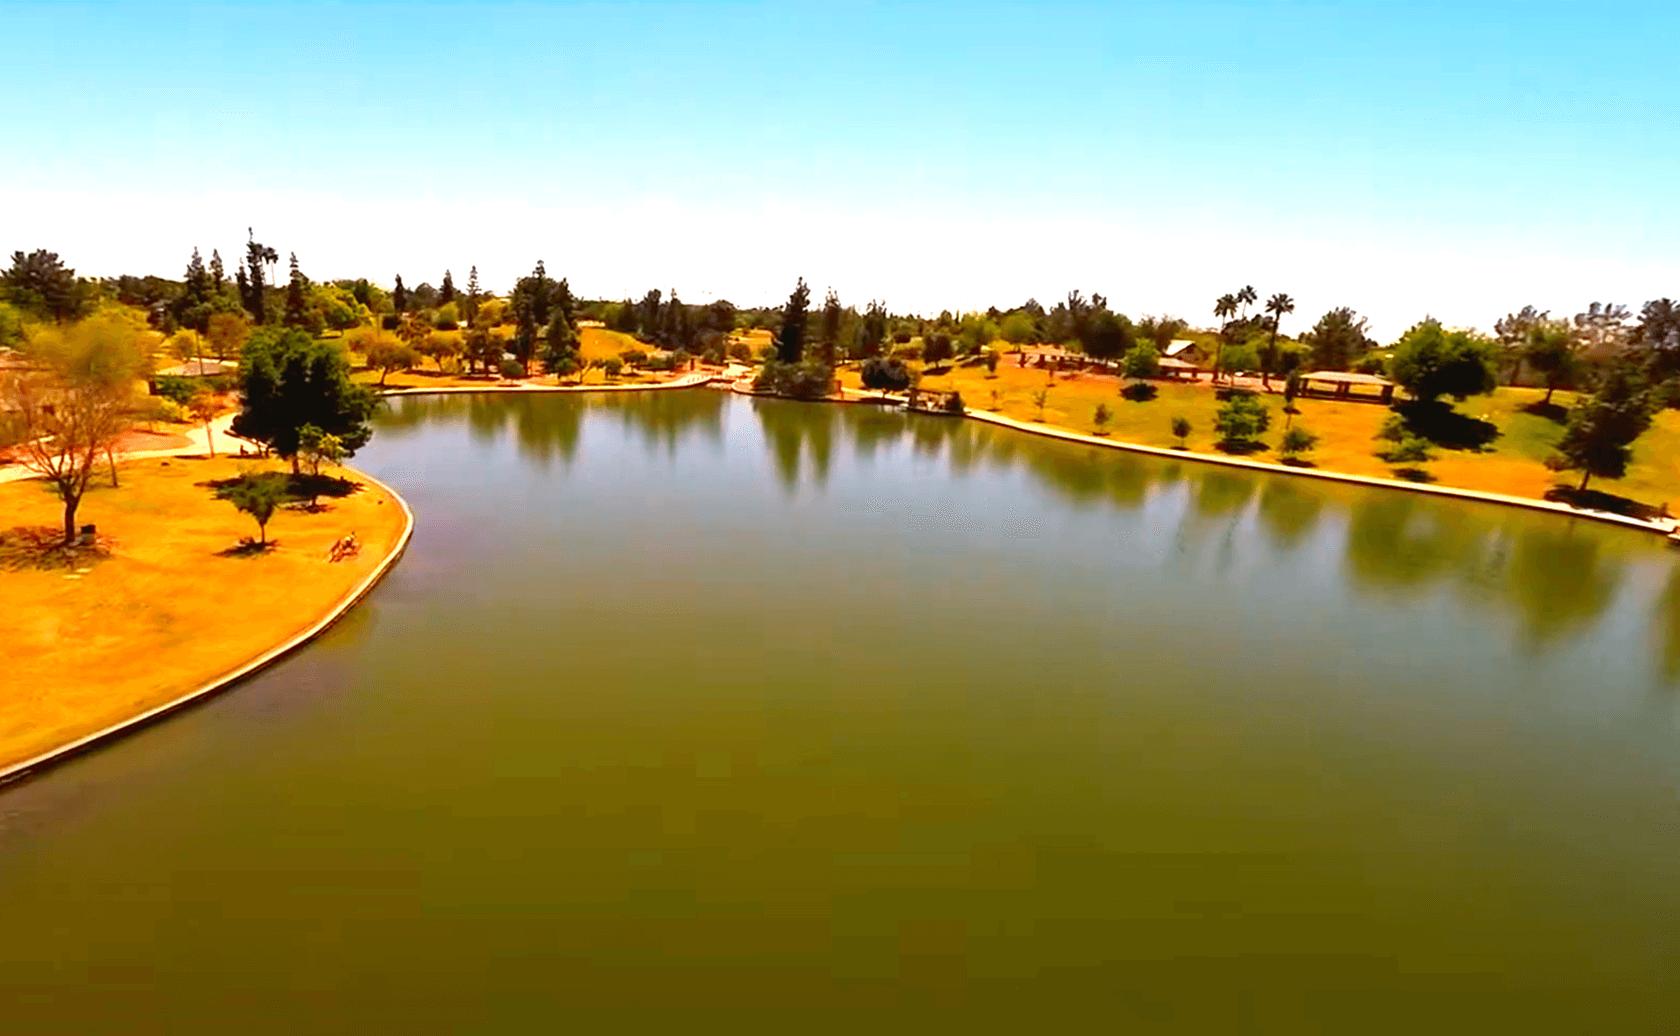 Kiwanis-Lake-Fishing-Guide-Tempe-AZ-01